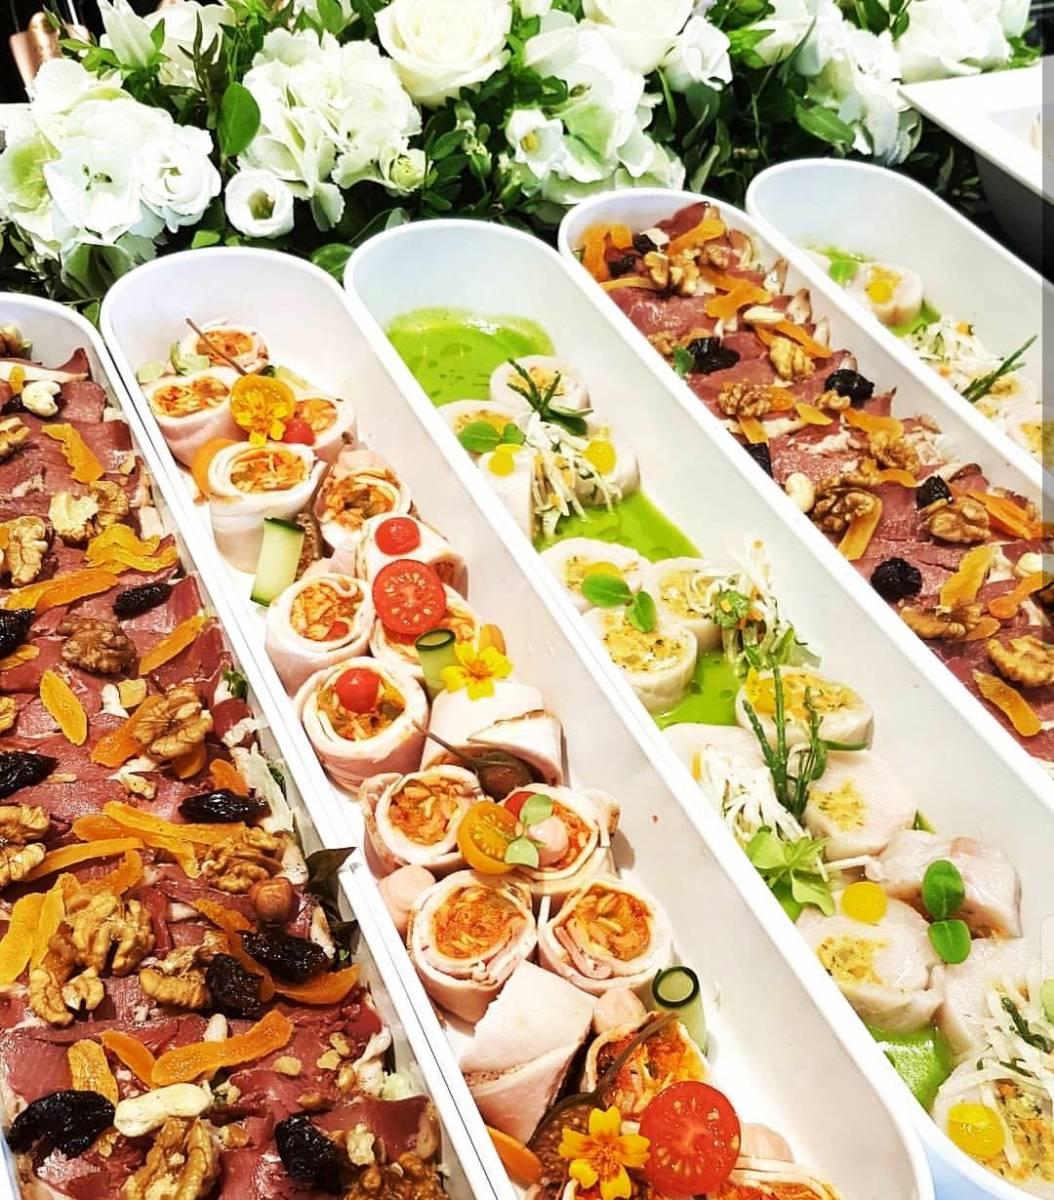 Cardinal Catering - Catering - Cateraar - House of Weddings - 6